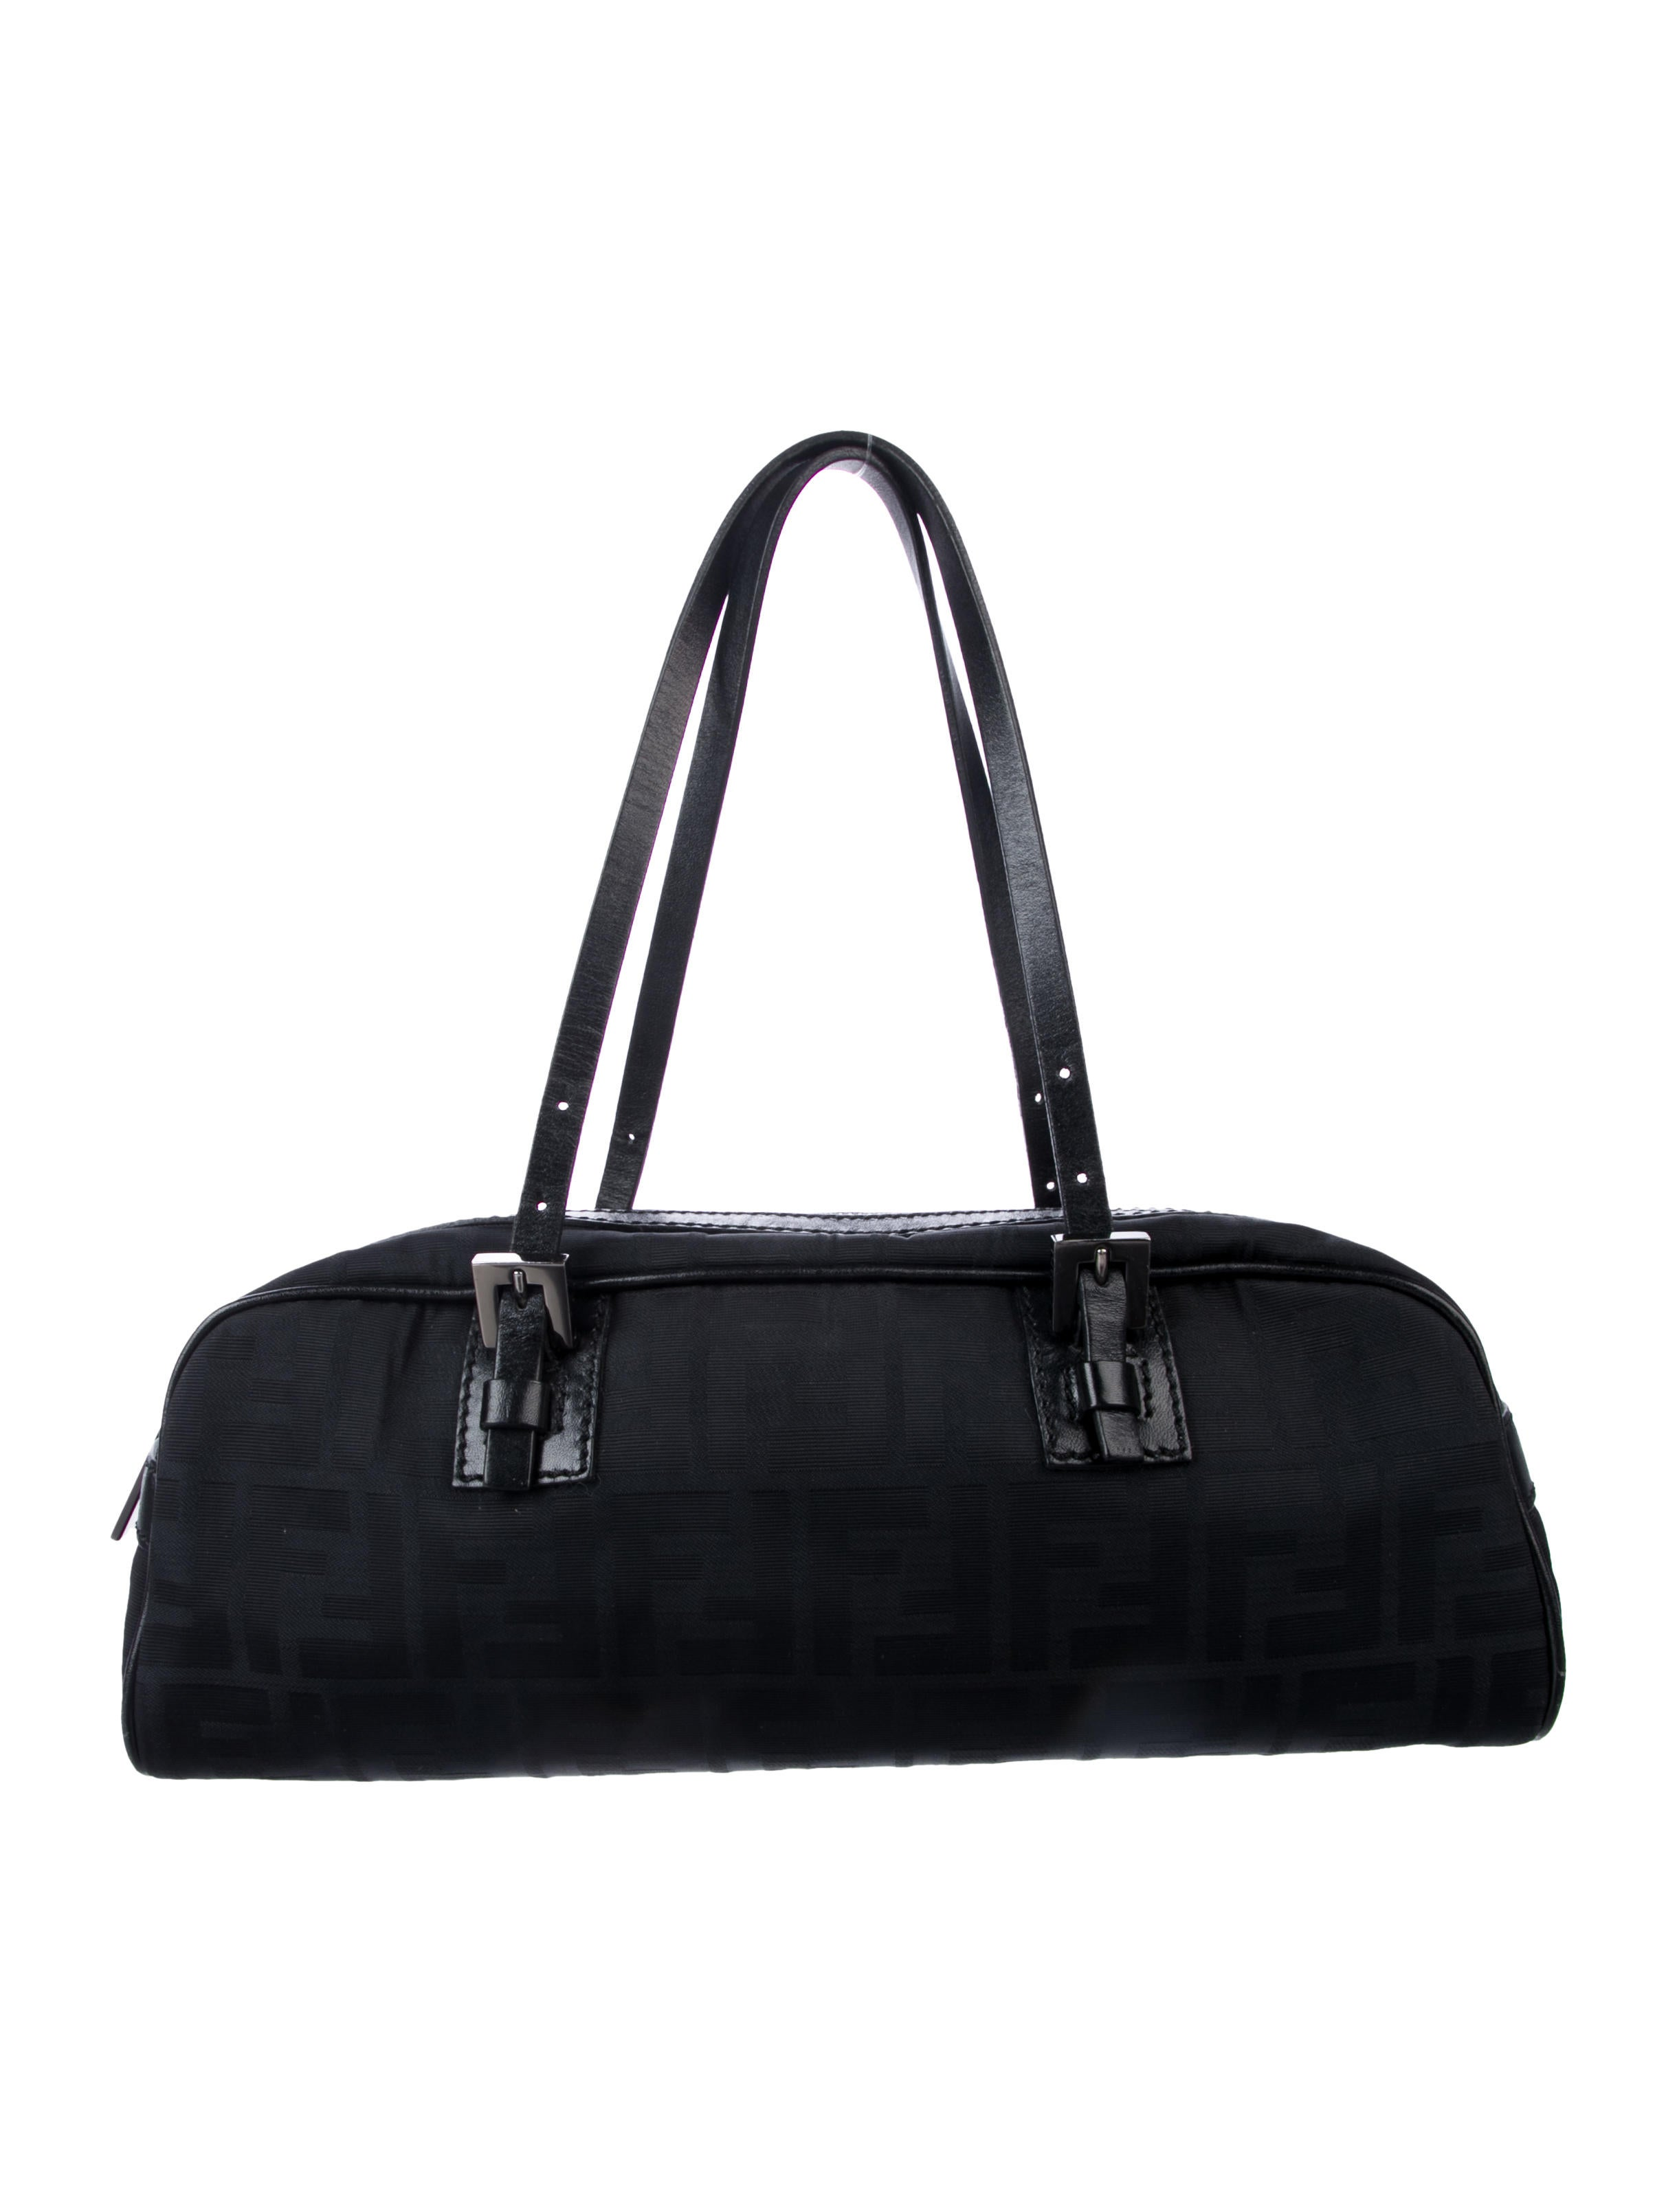 87ff005246 Fendi Leather-Trimmed Zucca Bag - Handbags - FEN99108